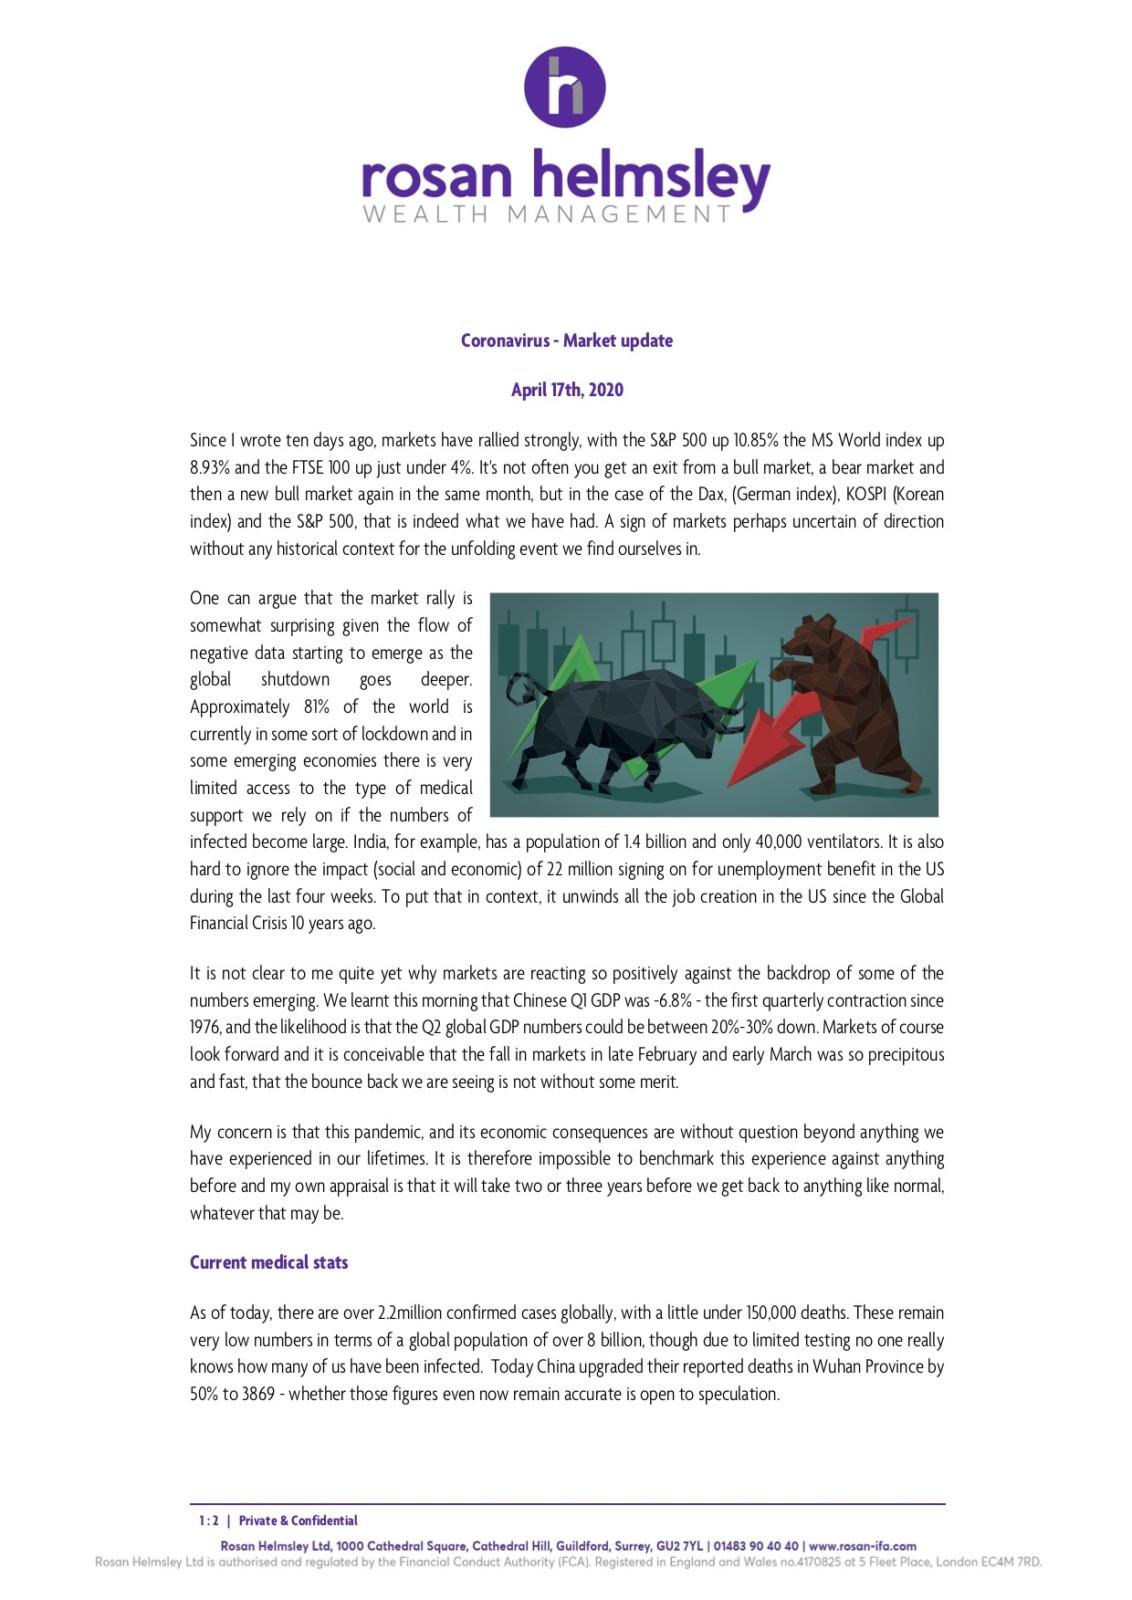 Coronavirus update – 17th April 2020